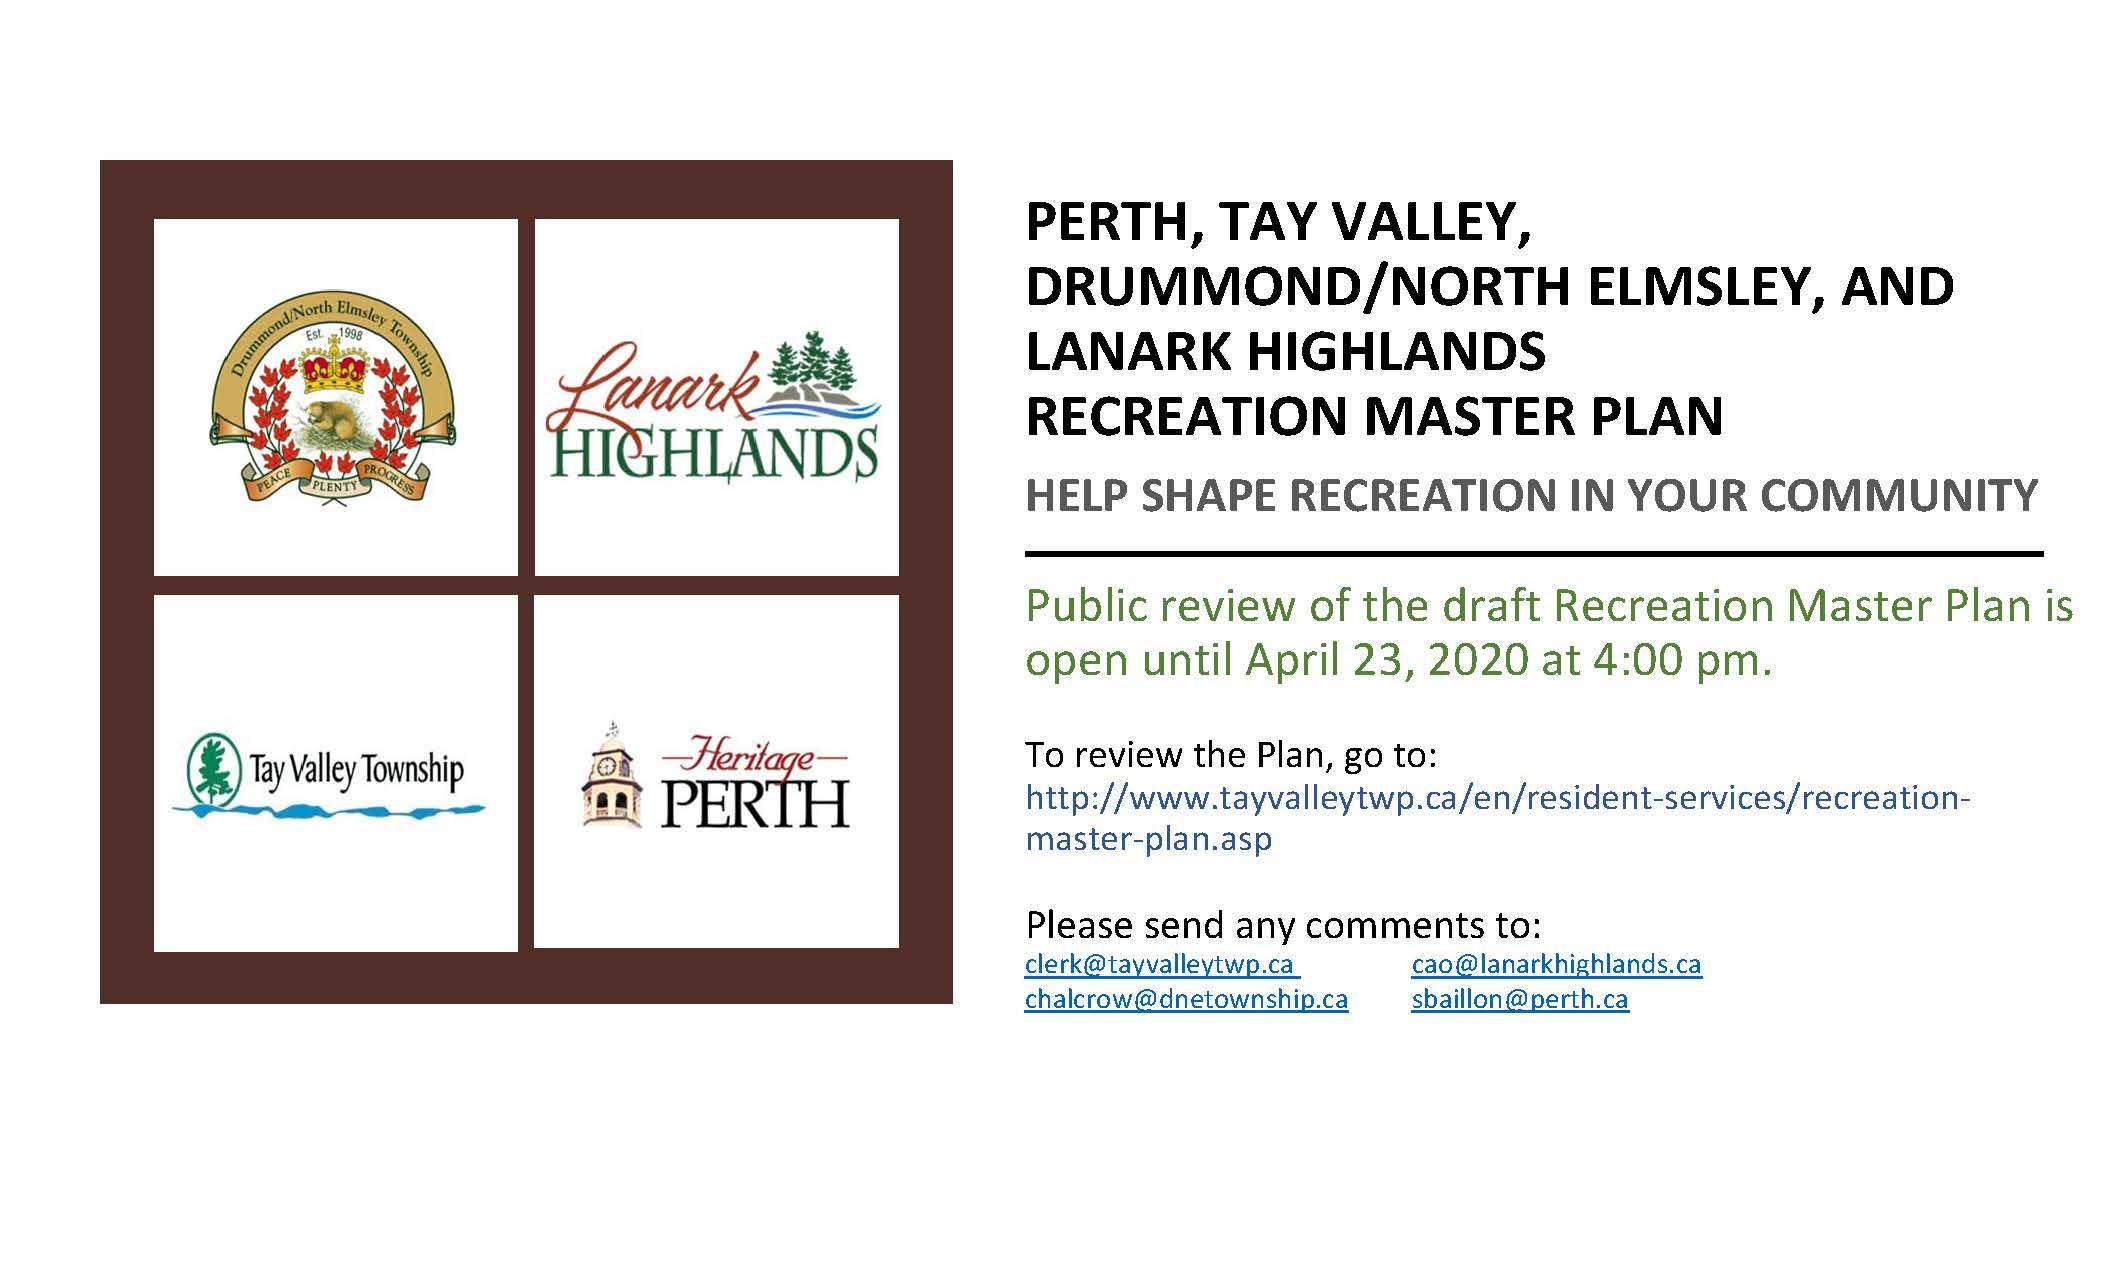 20-03-13 - Recreation Master Plan - Final Public Review - Notice